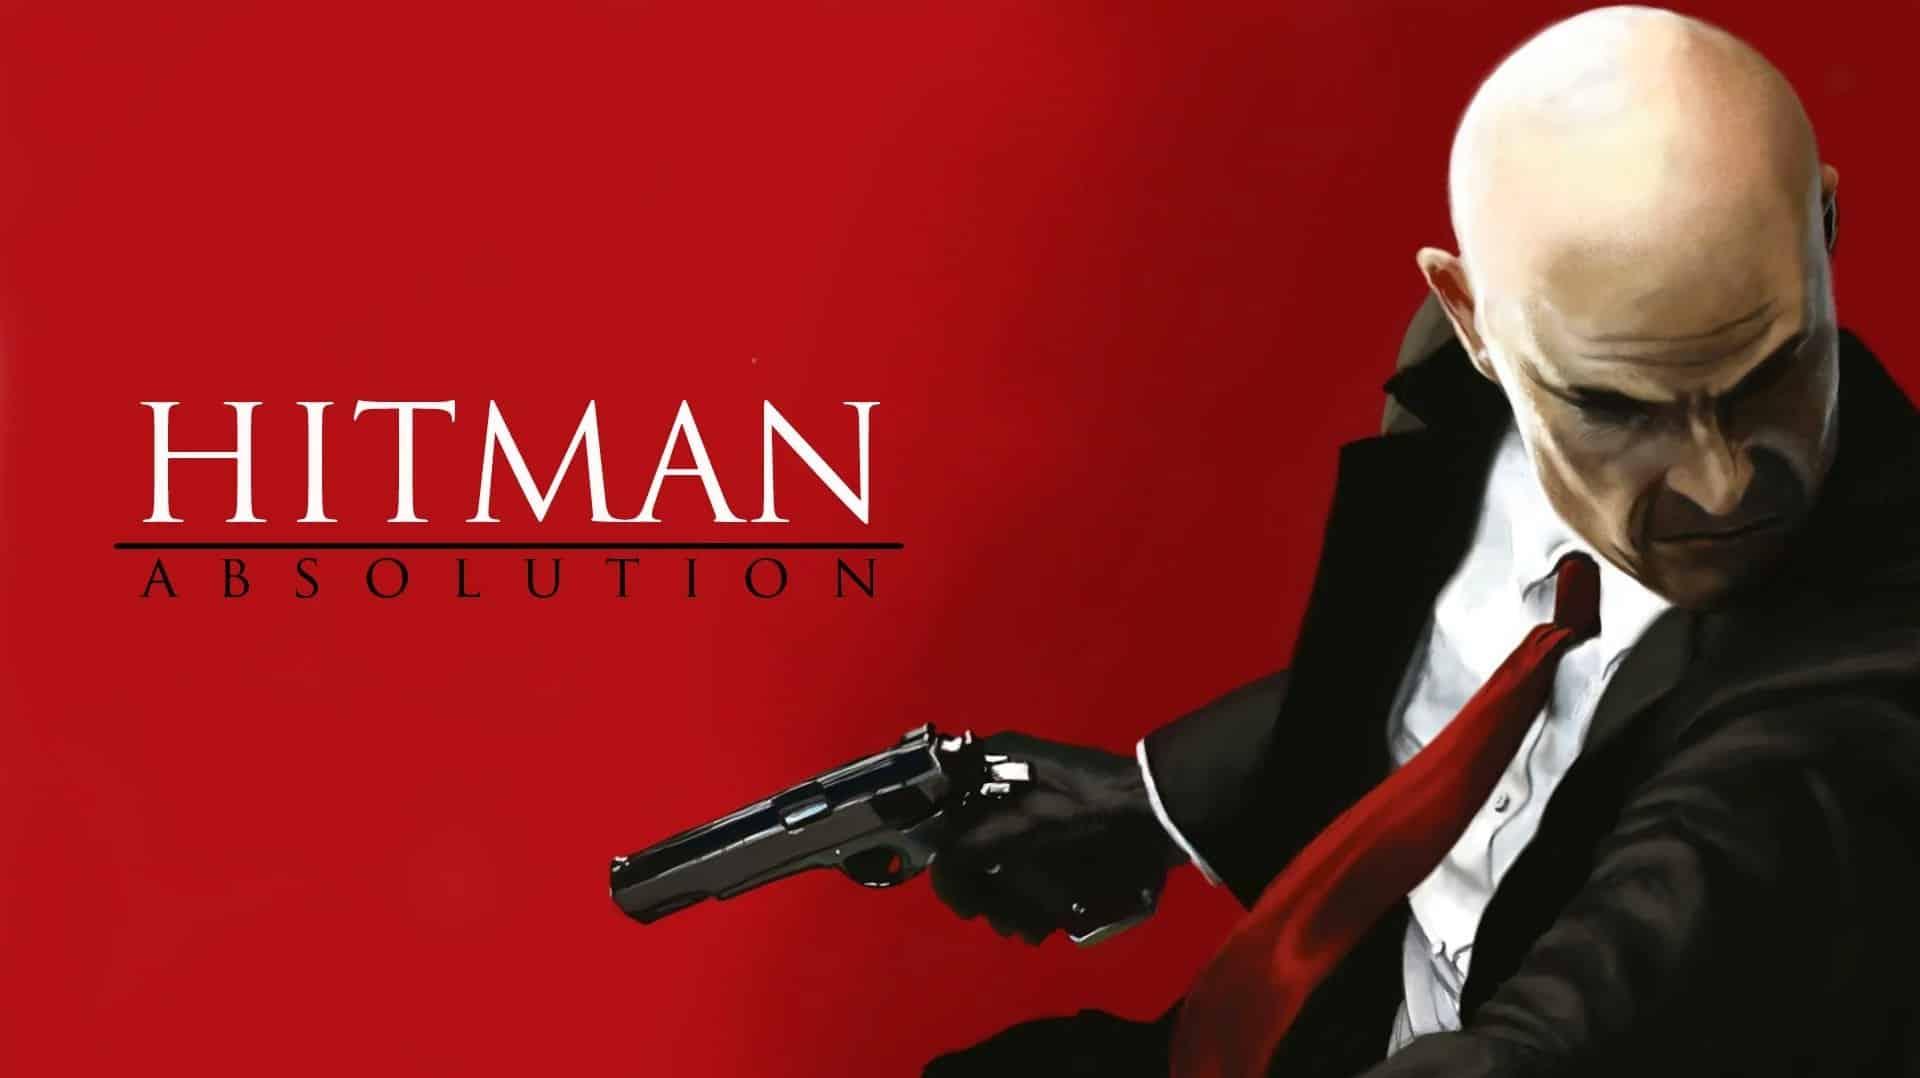 Free Games Hitman Absolution